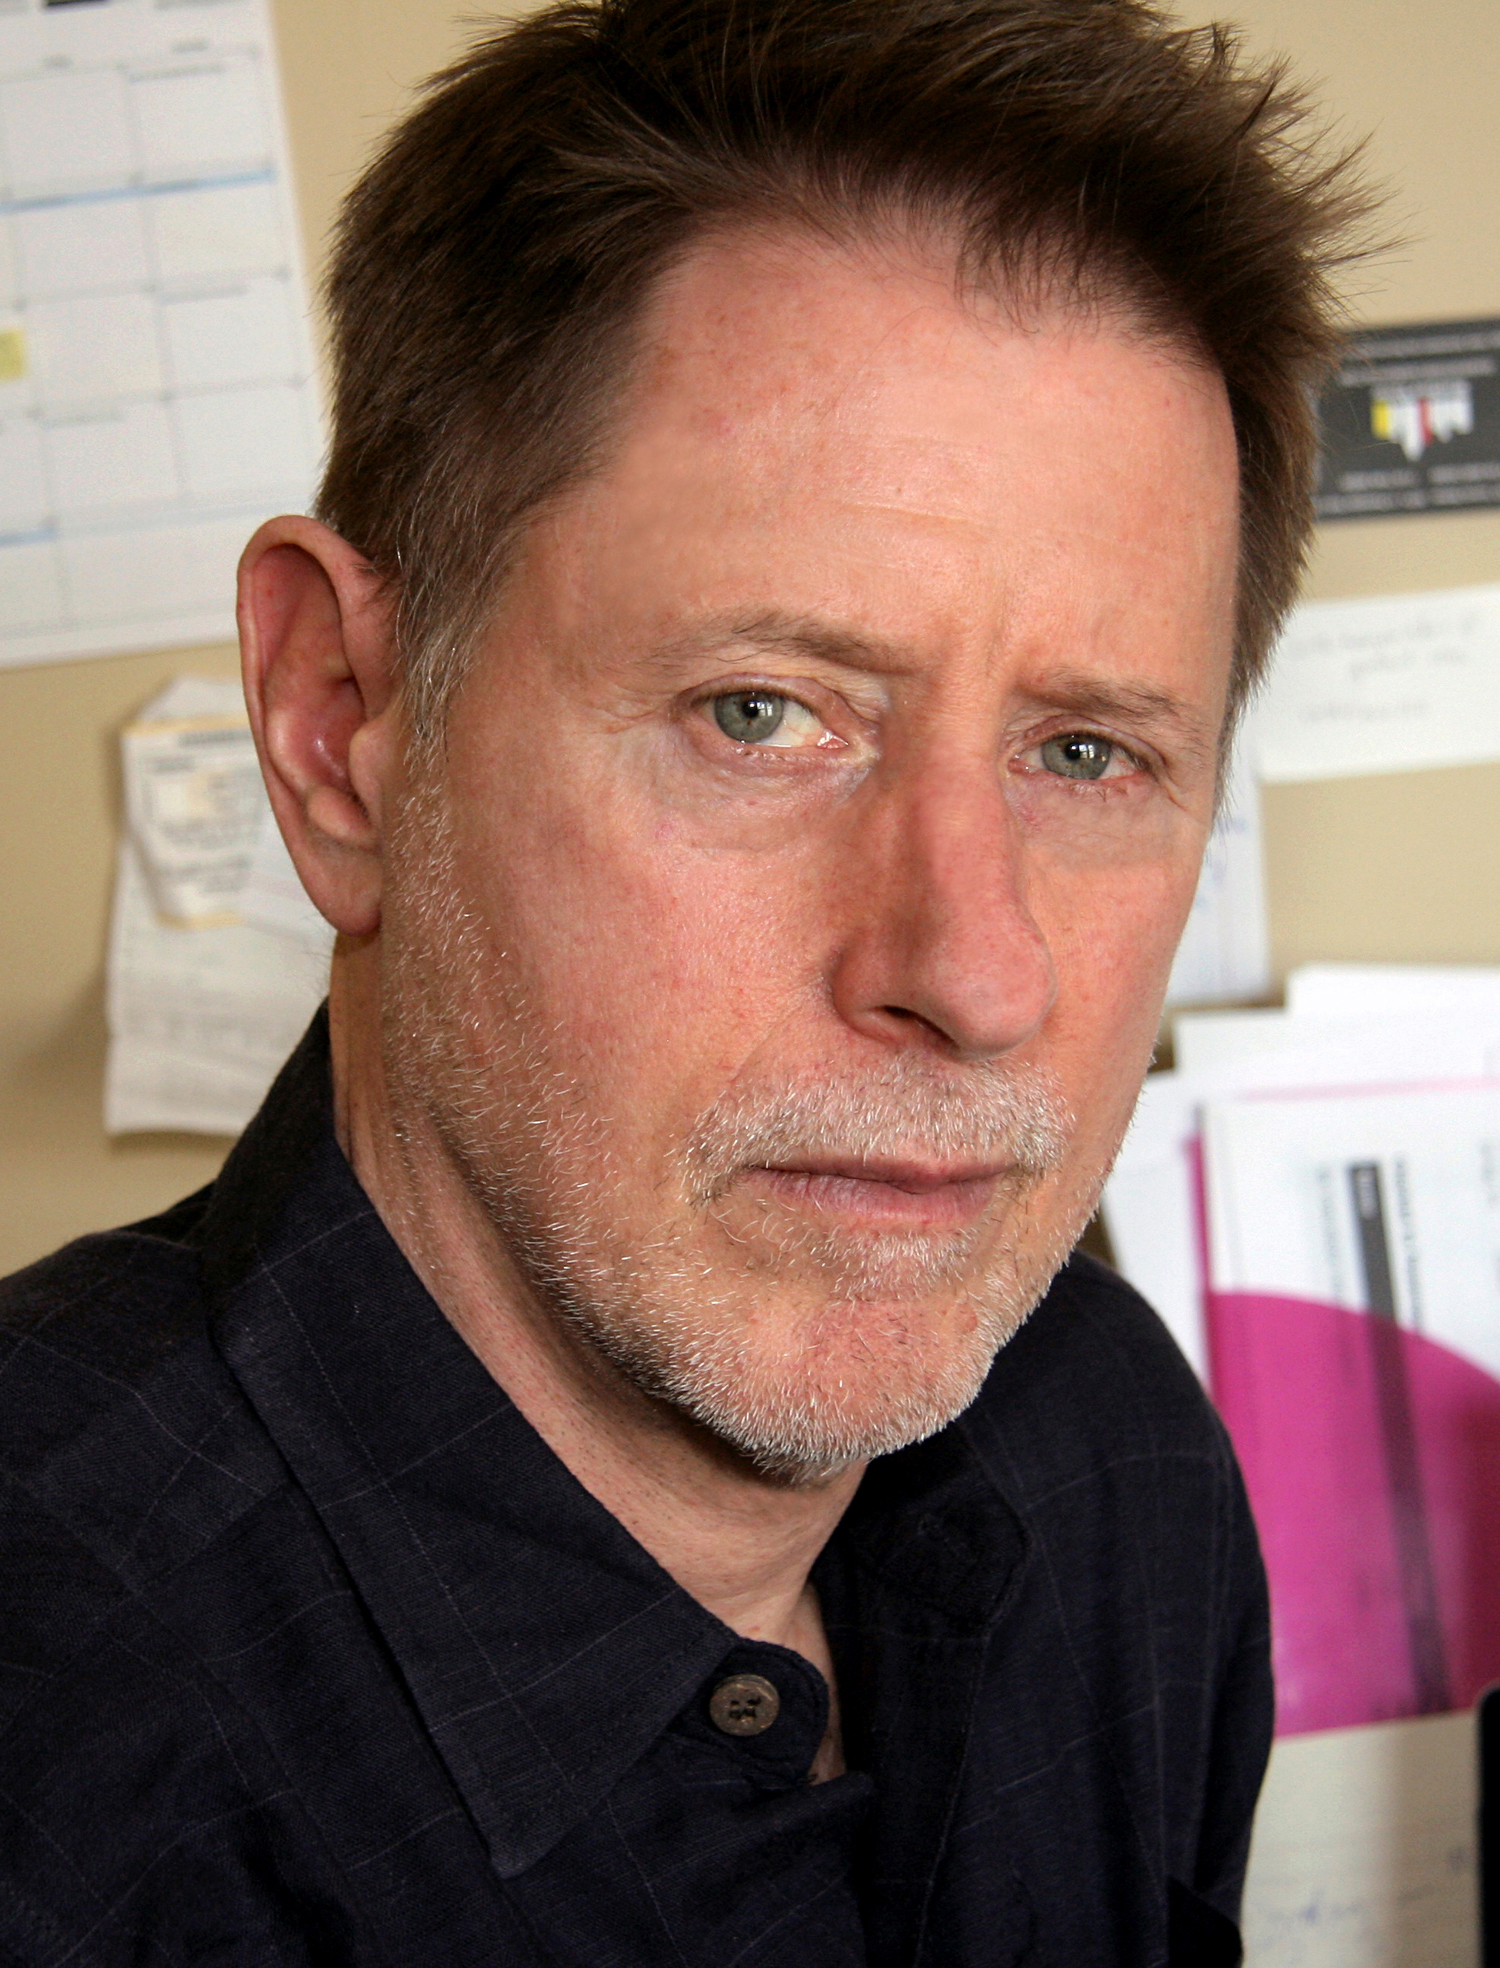 Tim Tomlinson